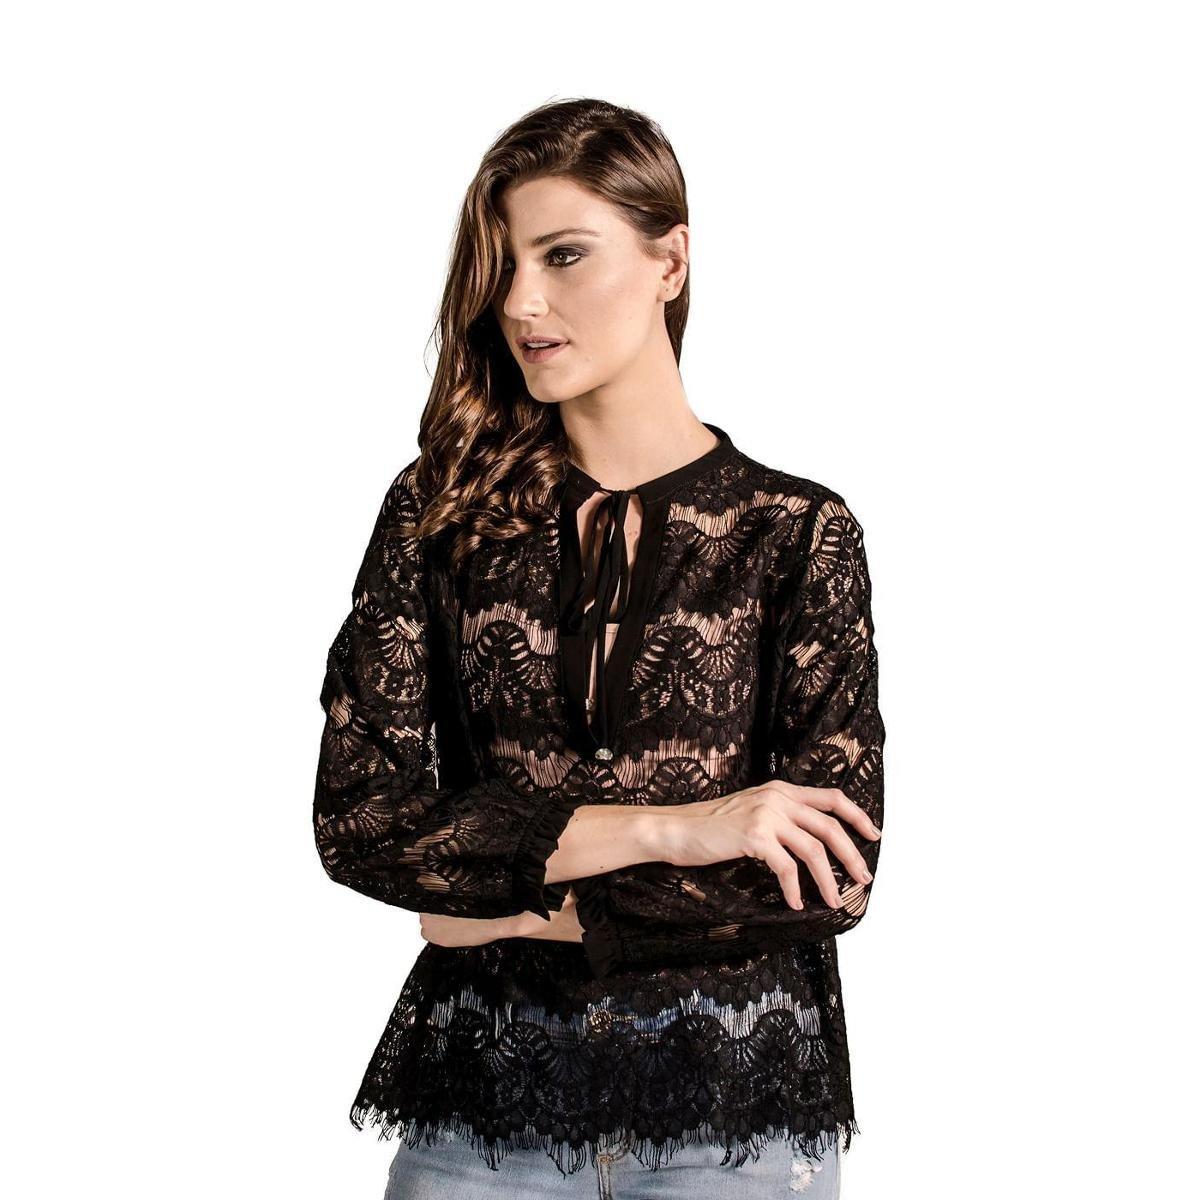 cccac13c9c Blusa Renda Vazada Manga Longa Lume Feminina - Compre Agora